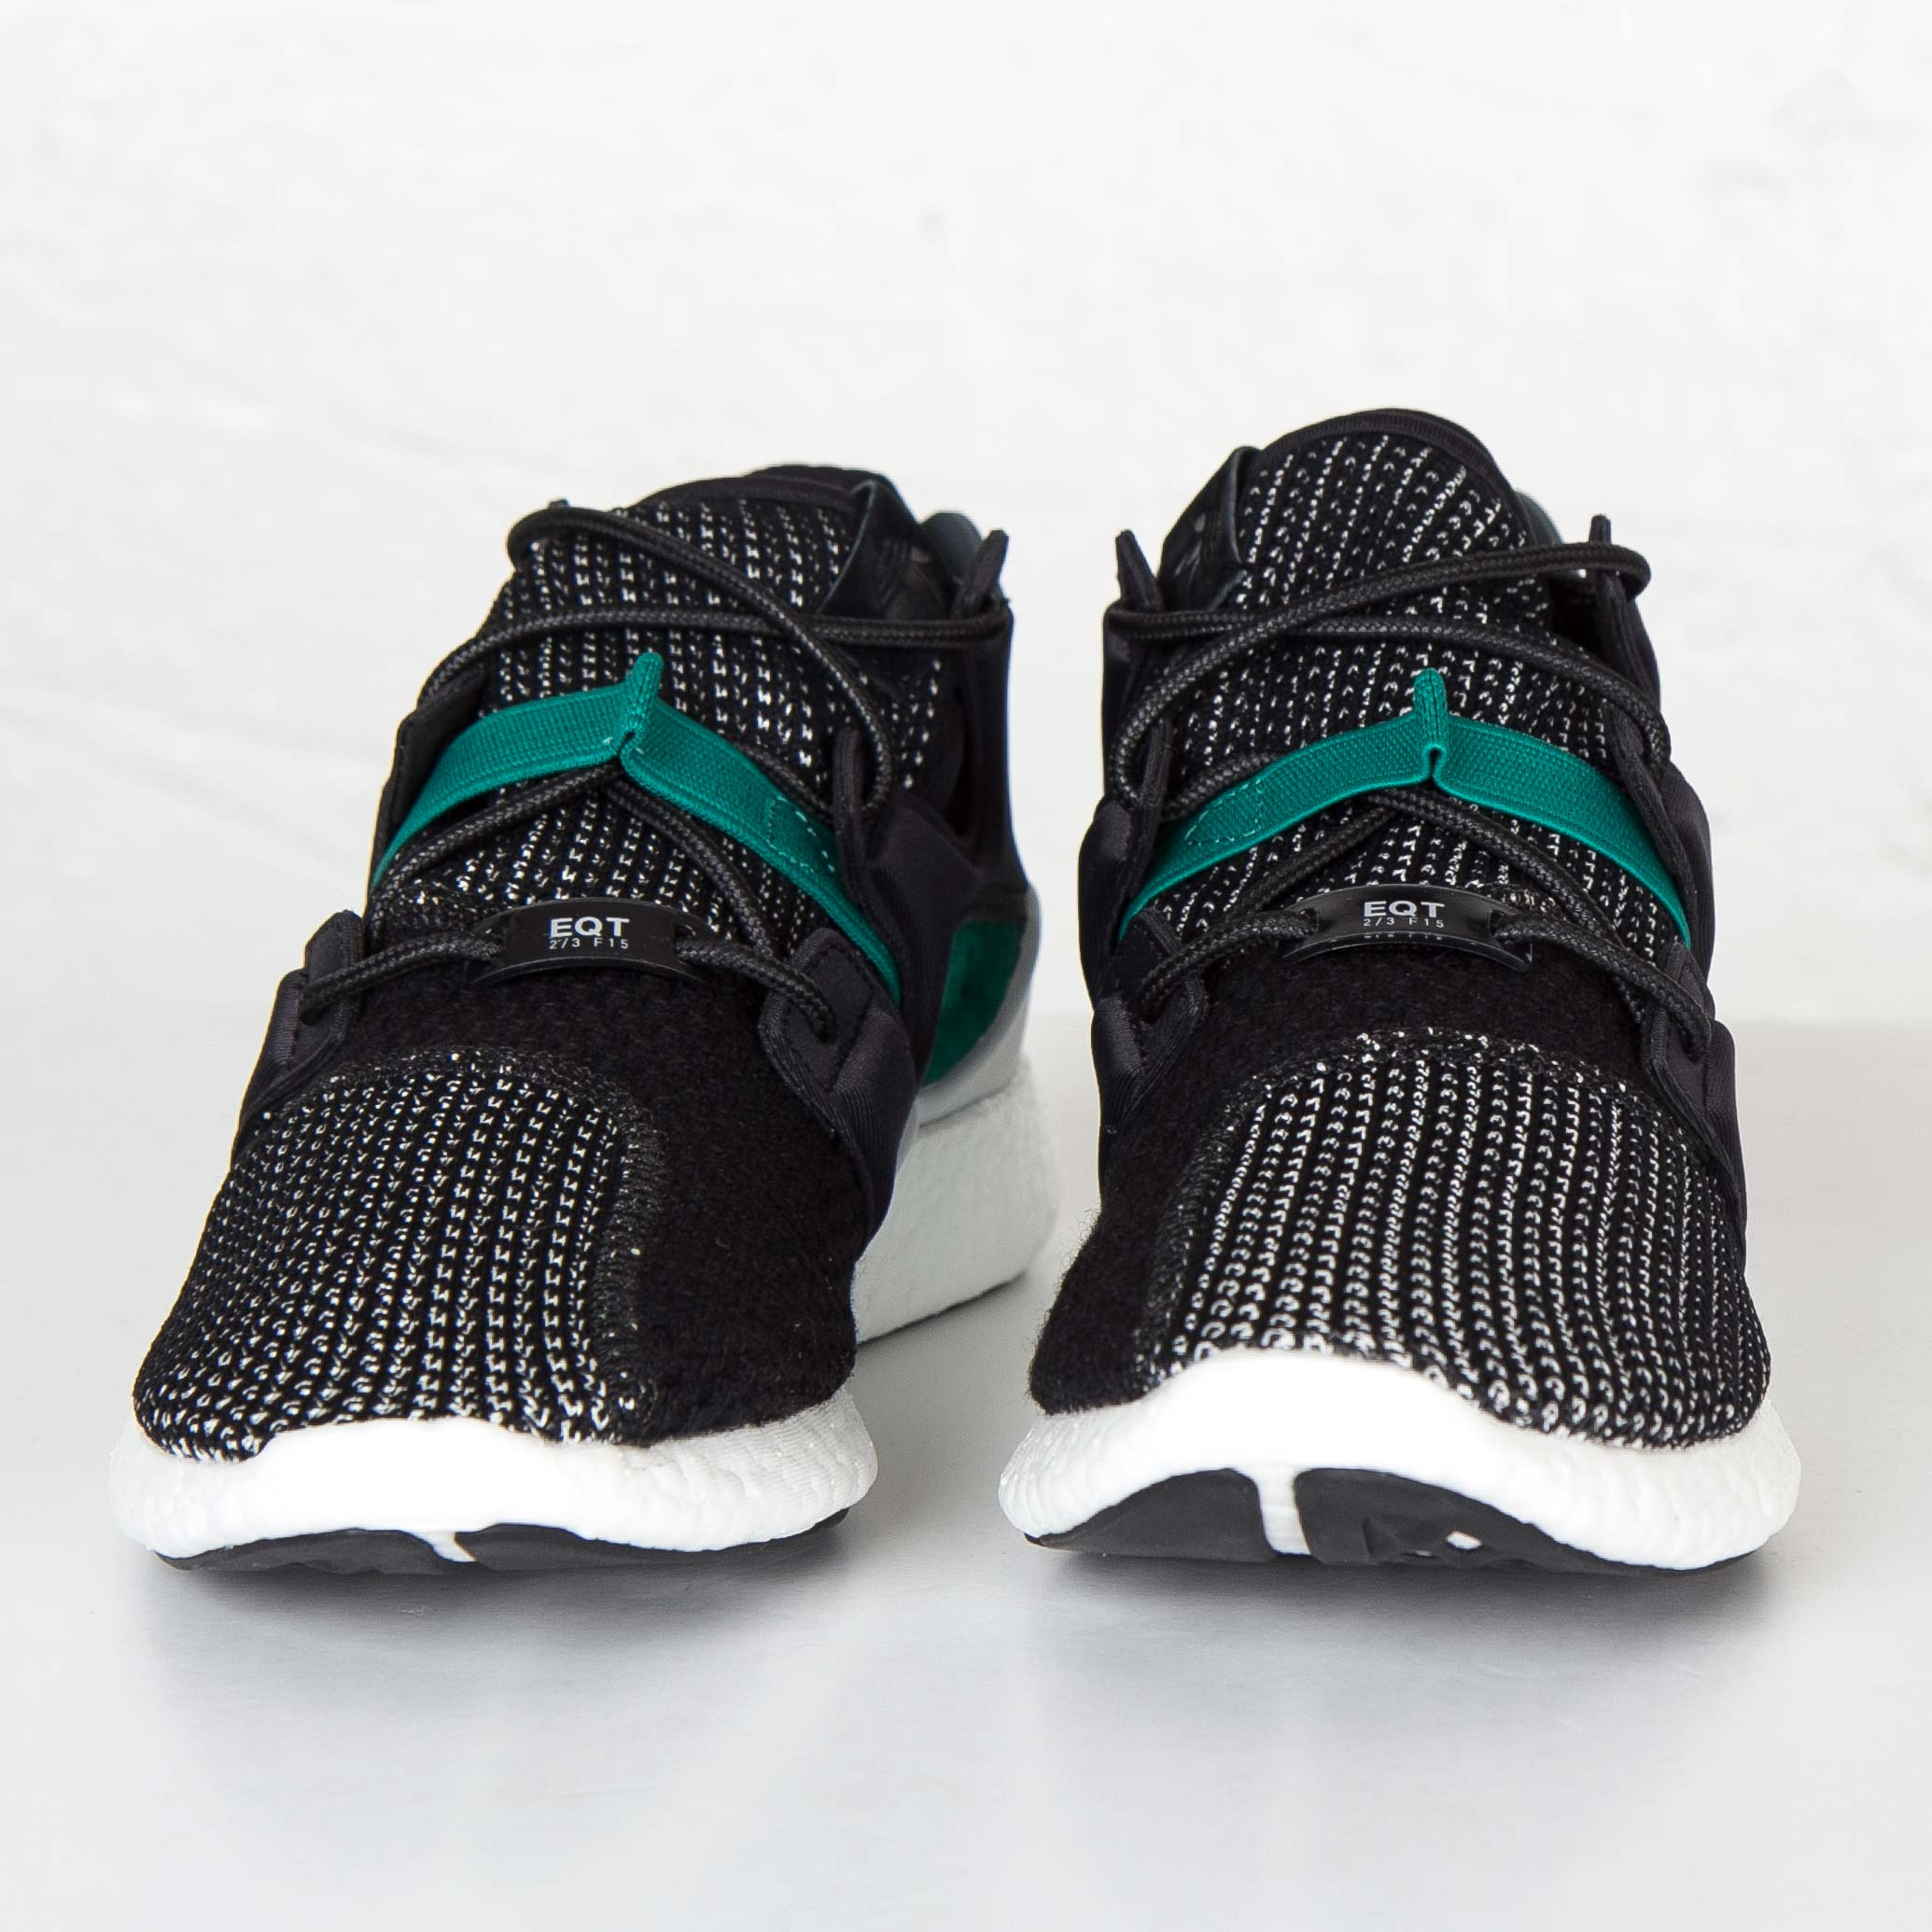 adidas EQT 2/3 F15 OG - Aq5097 - SNS   sneakers & streetwear ...